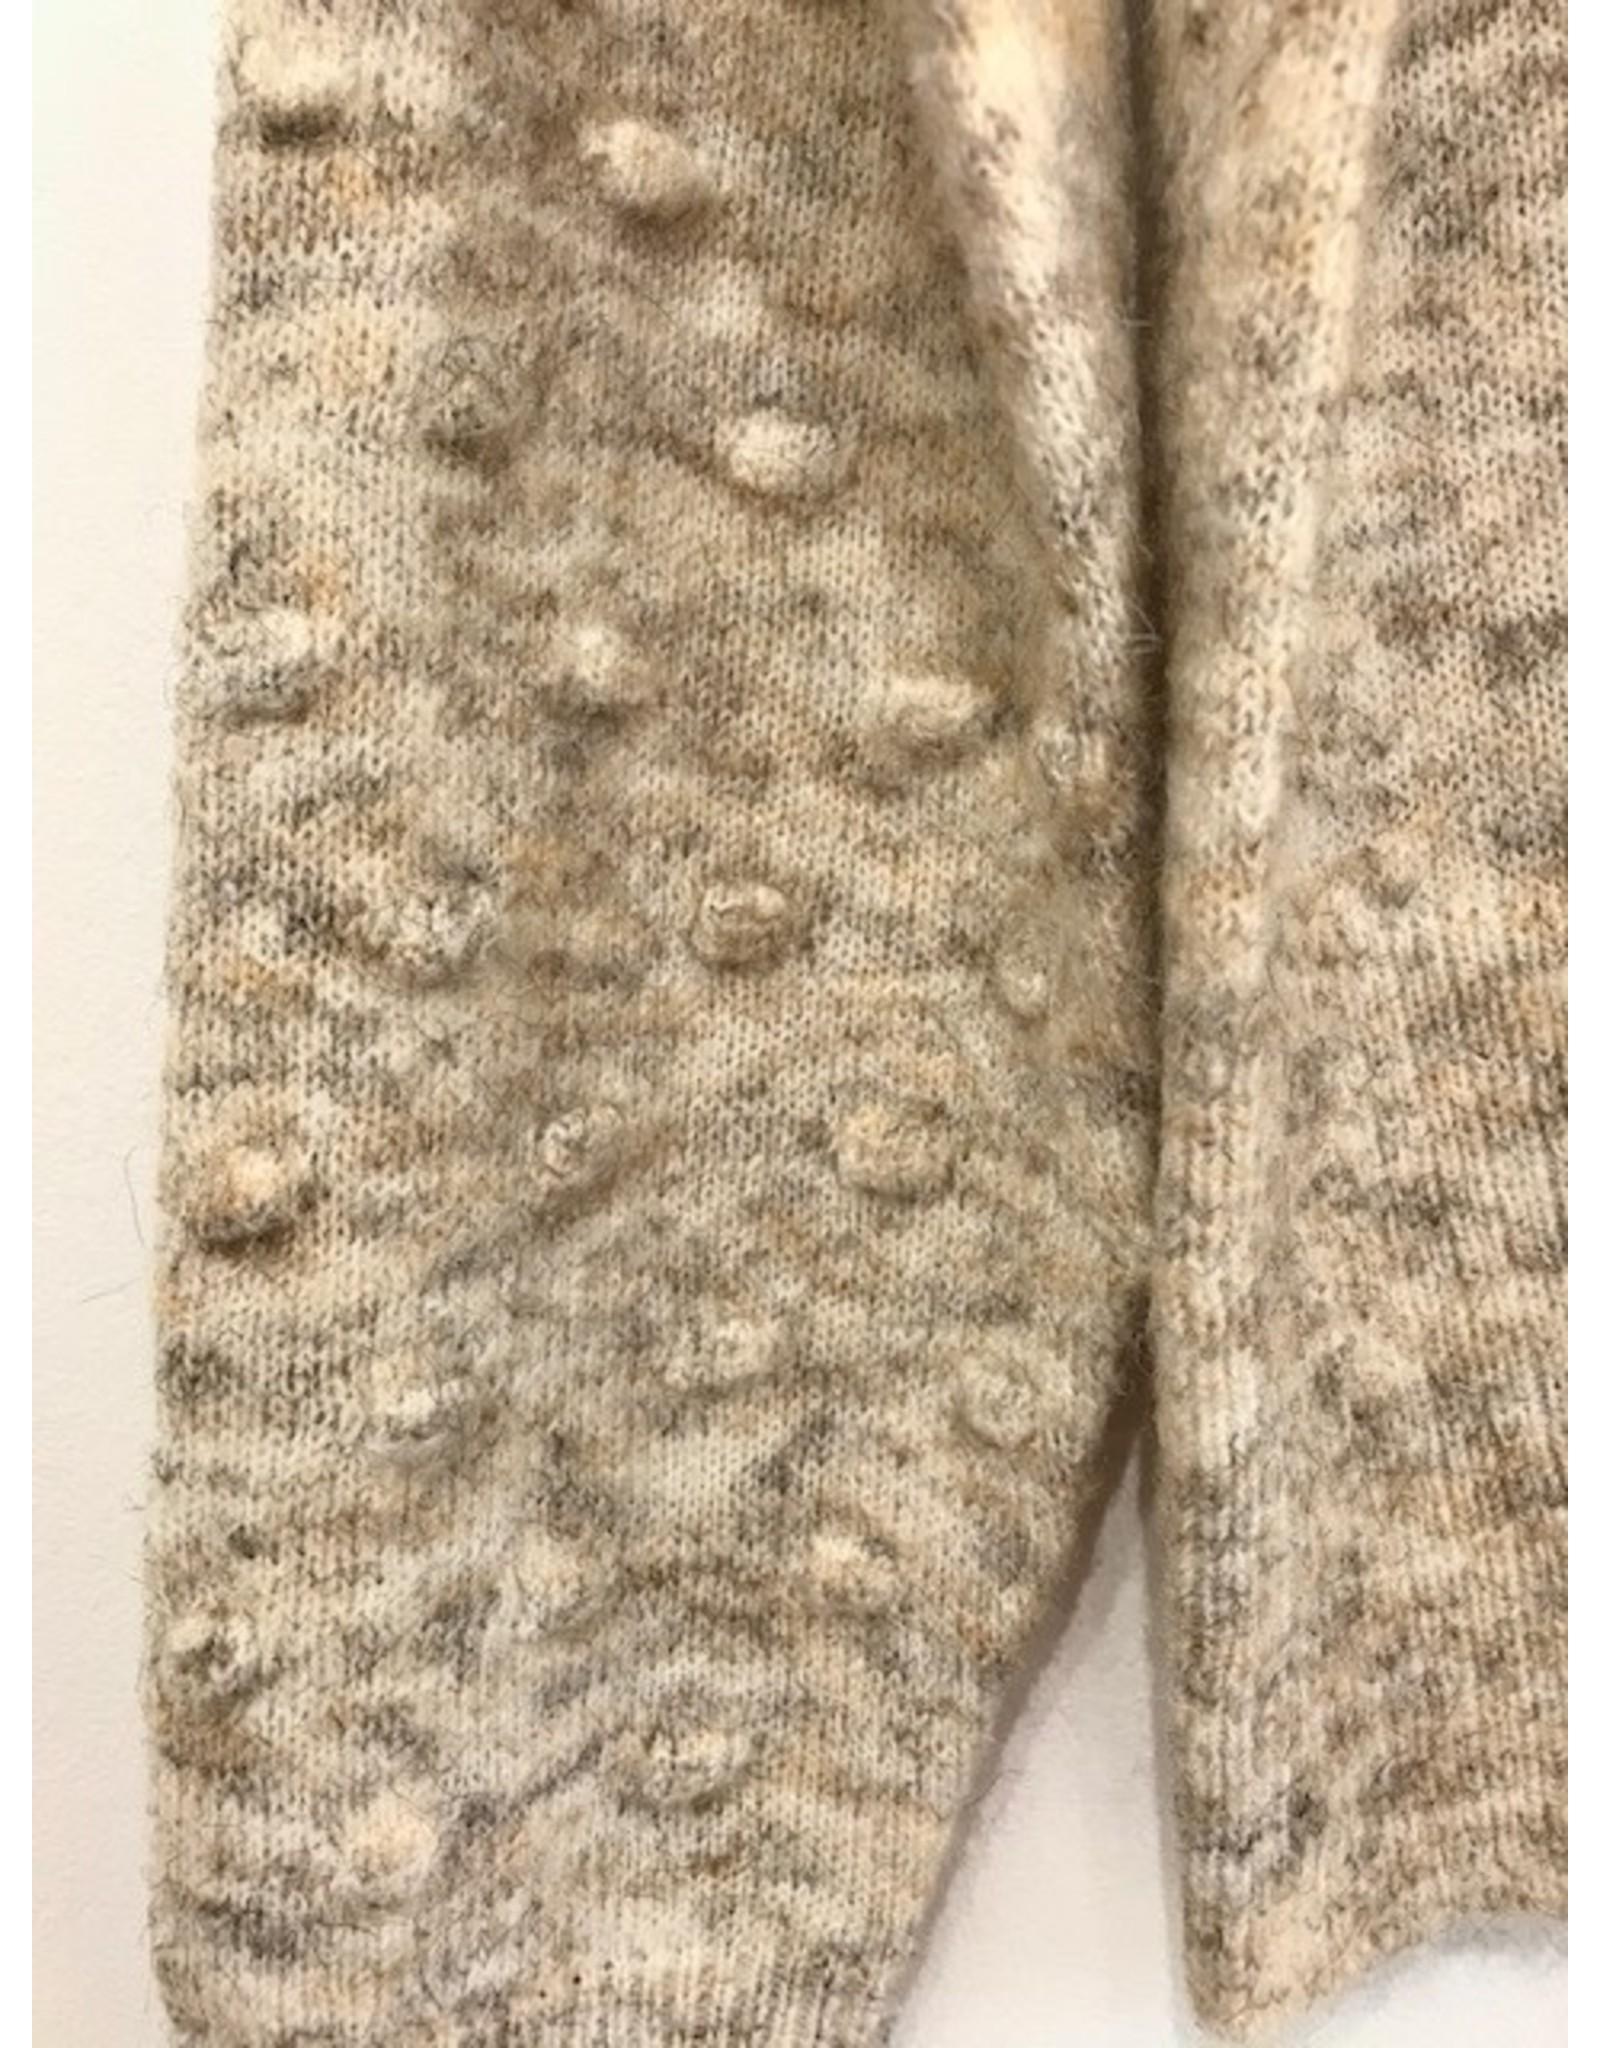 Luna Blue Luna Blue - Mock neck sweater with popcorn sleeve detail (white beach mix)